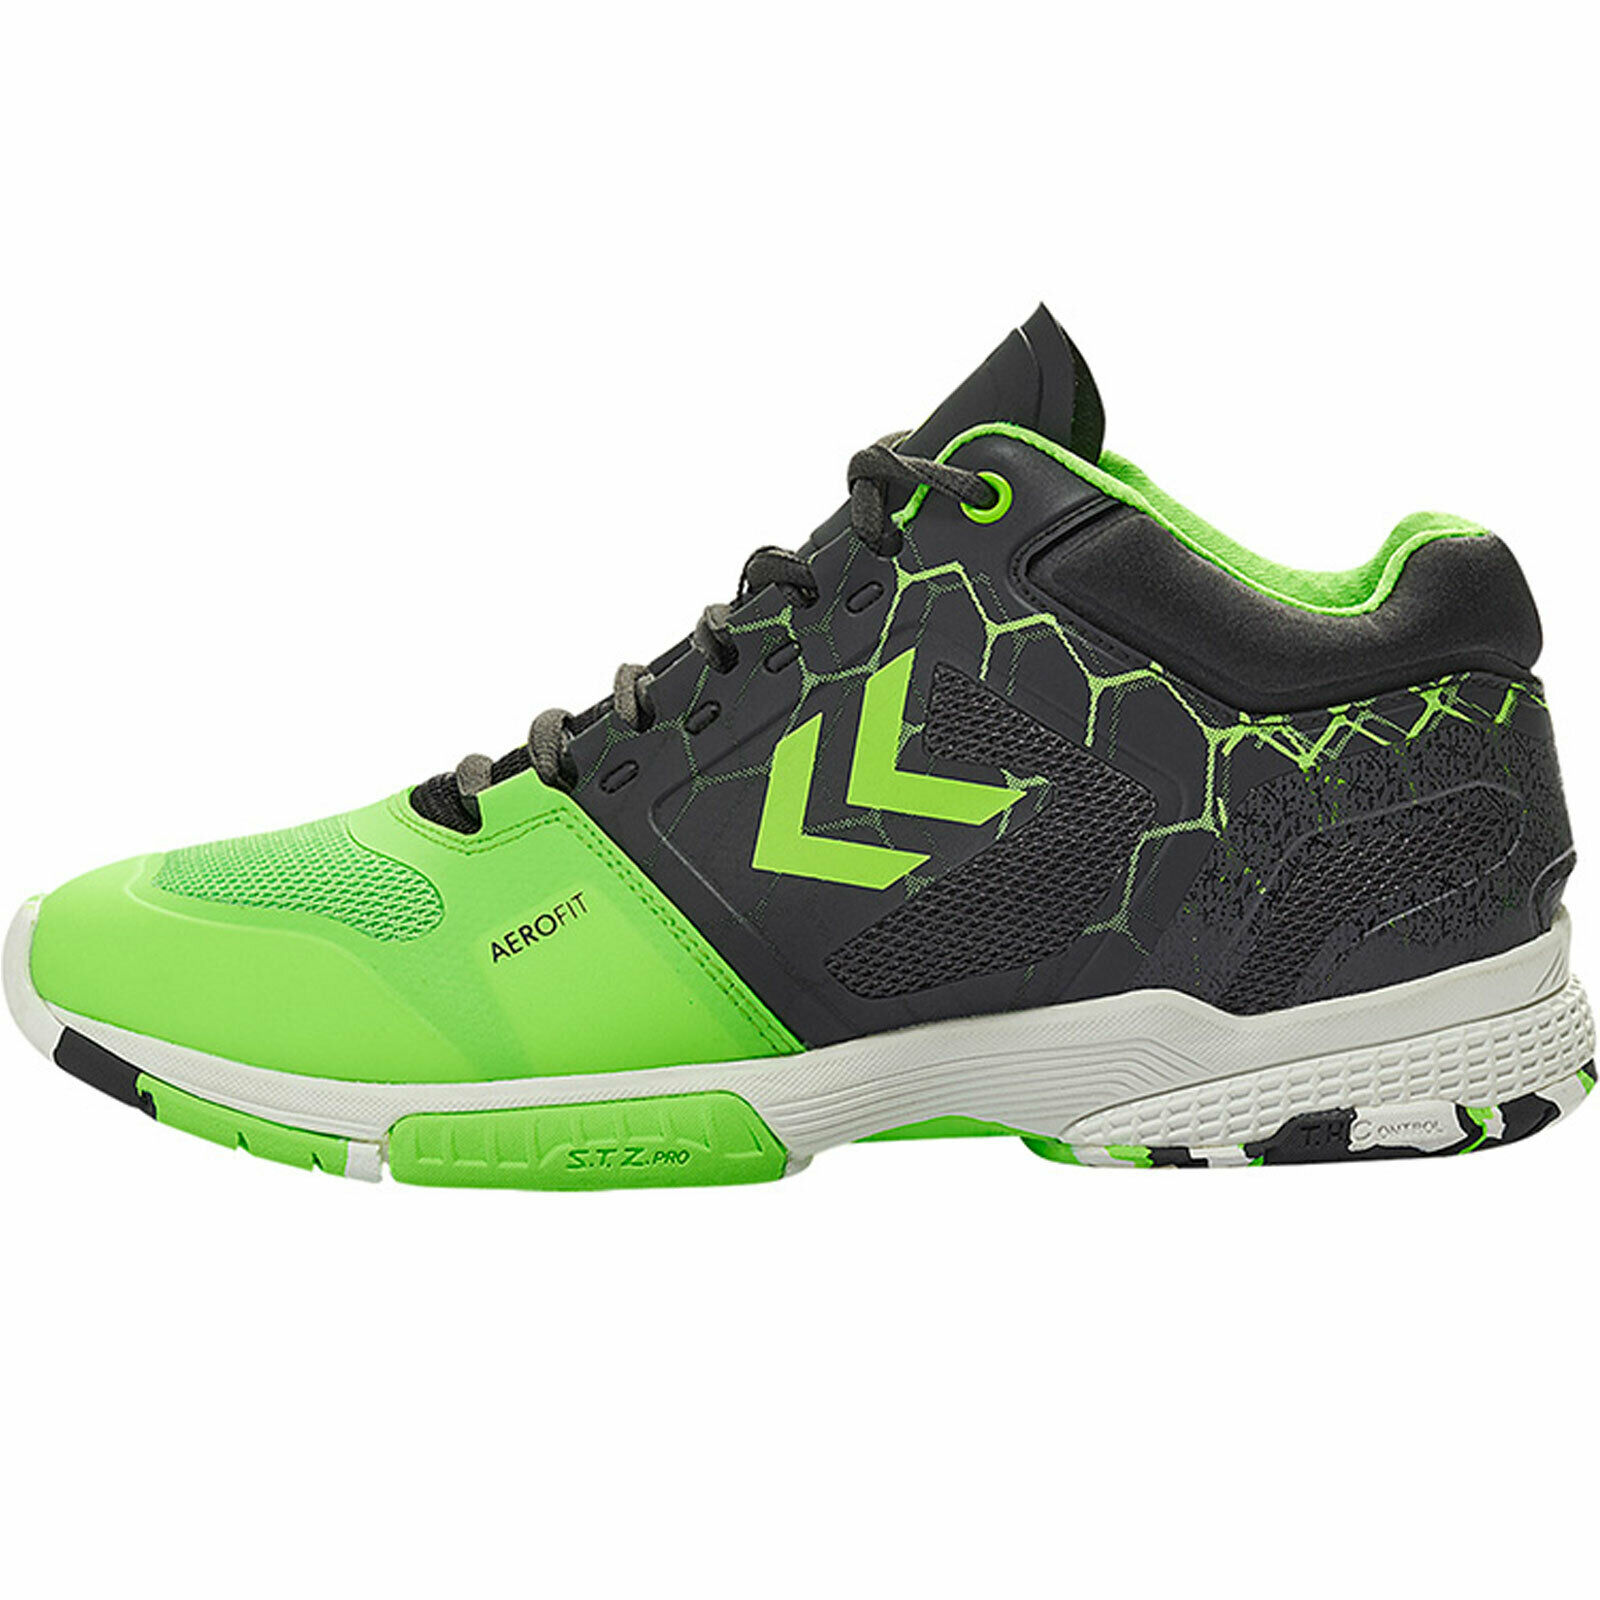 Hummel Aerocharge HB 220 2.0 Indoor Handball Shoes Trainers gray 201088 1525 WOW